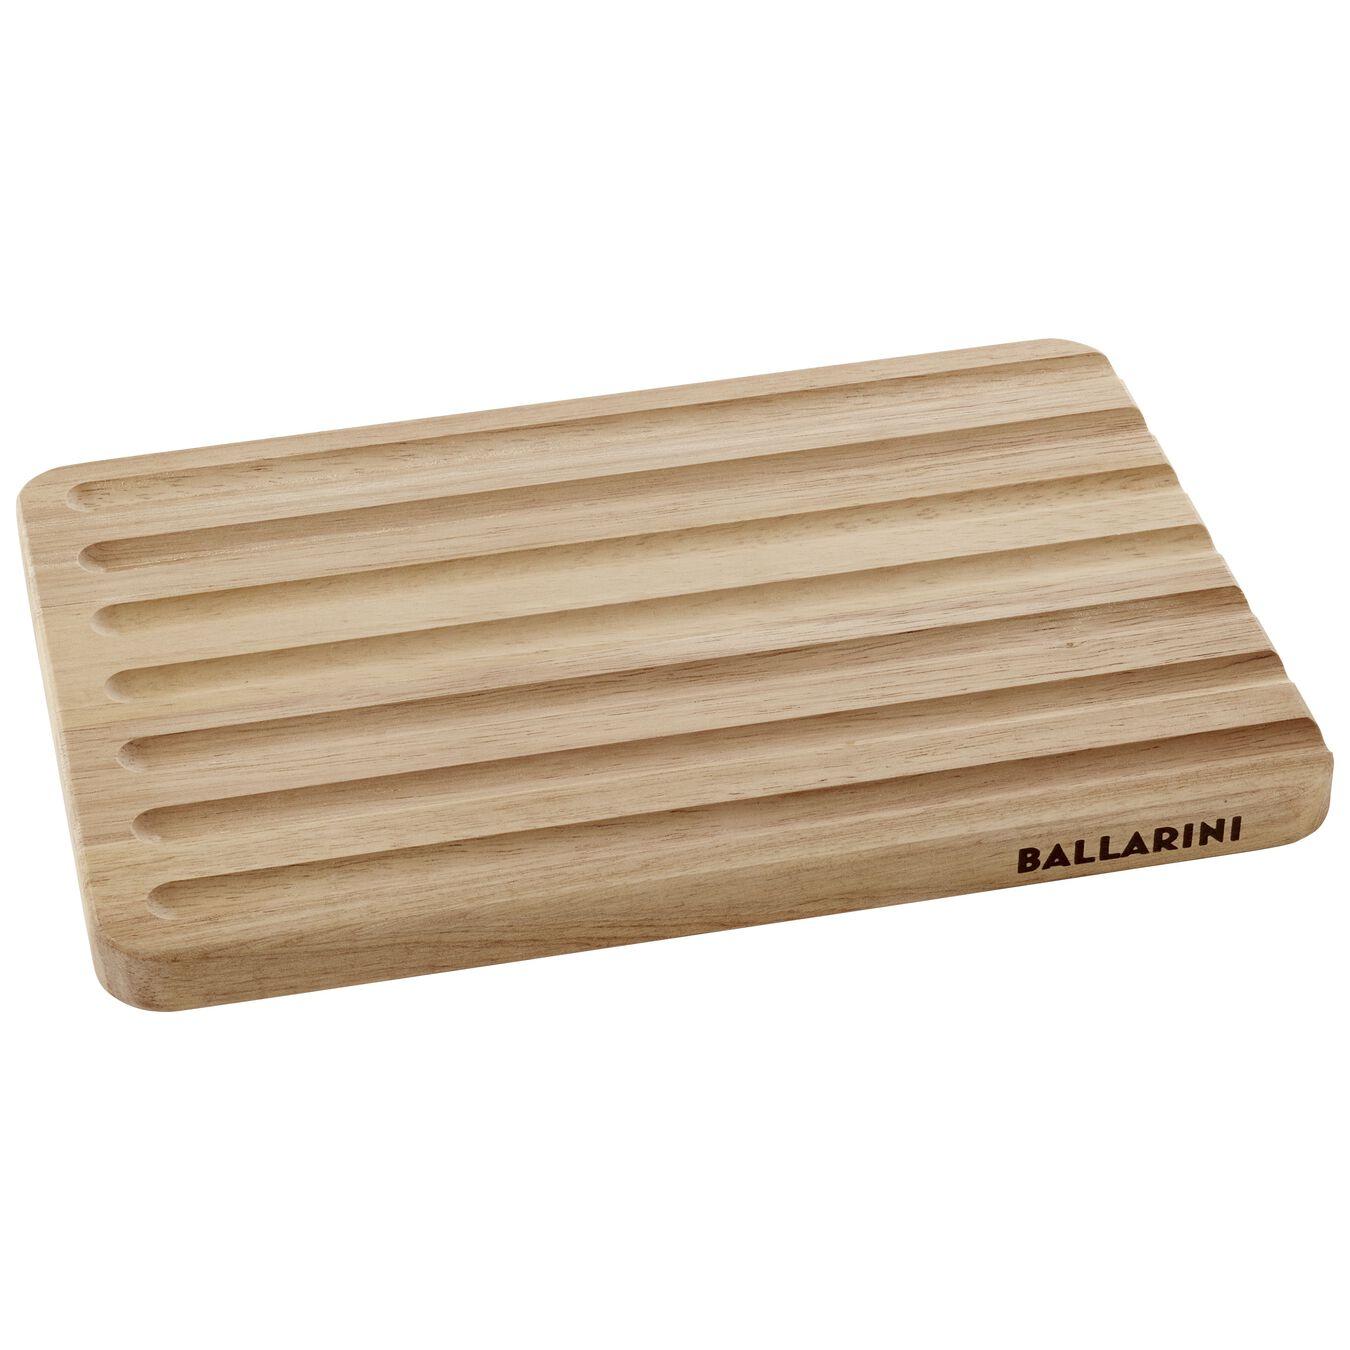 Cutting board 32 cm x 22 cm rubberwood,,large 1